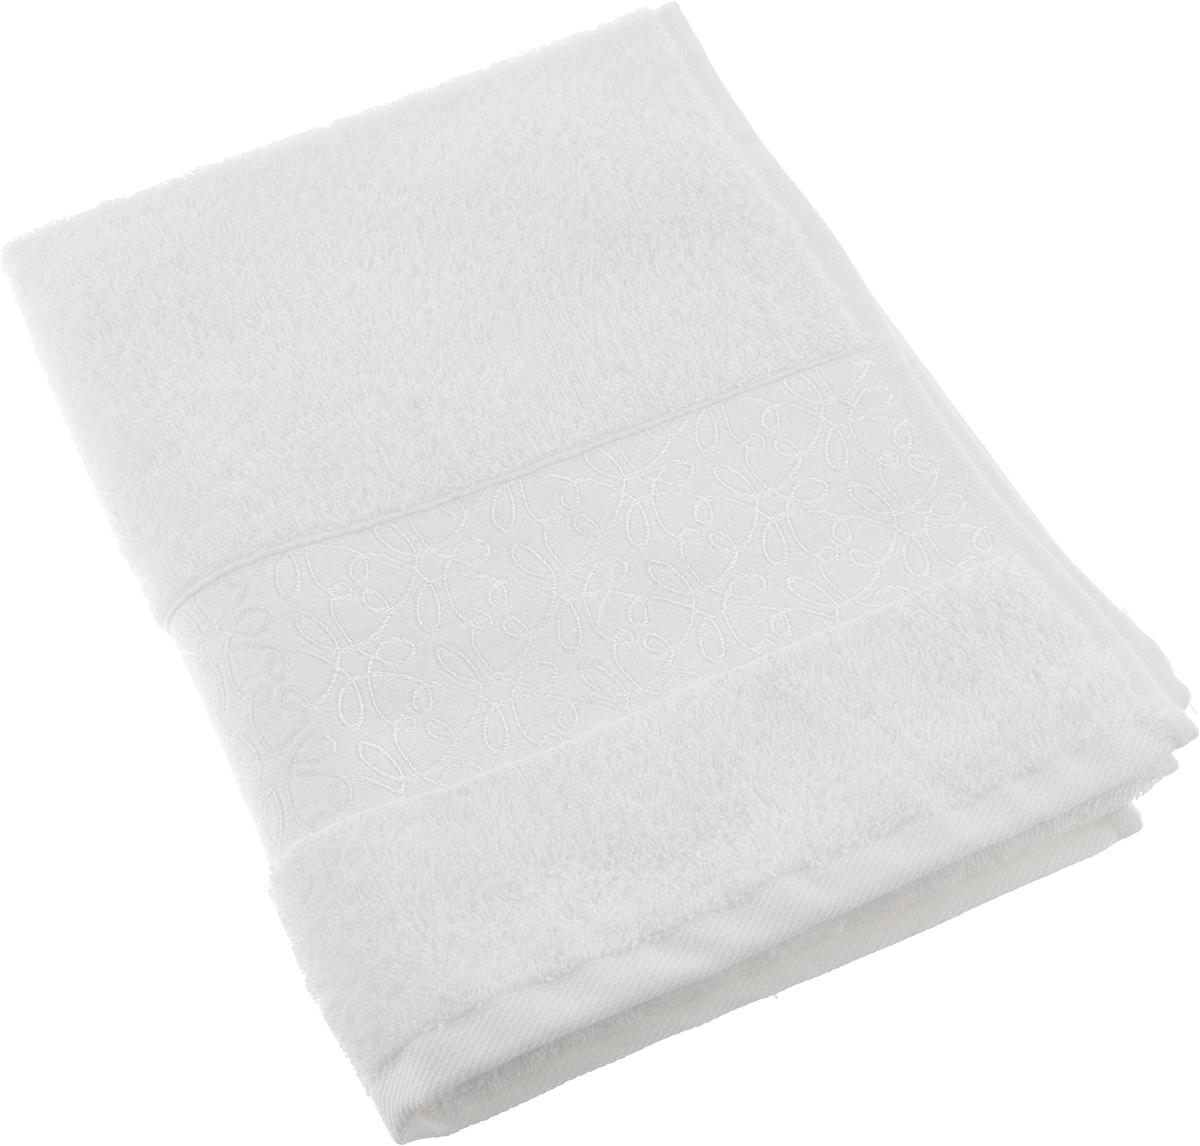 Полотенце махровое Issimo Home Perin, цвет: белый, 50 х 90 см полотенце бамбуковое issimo home valencia цвет розовый 90 x 150 см